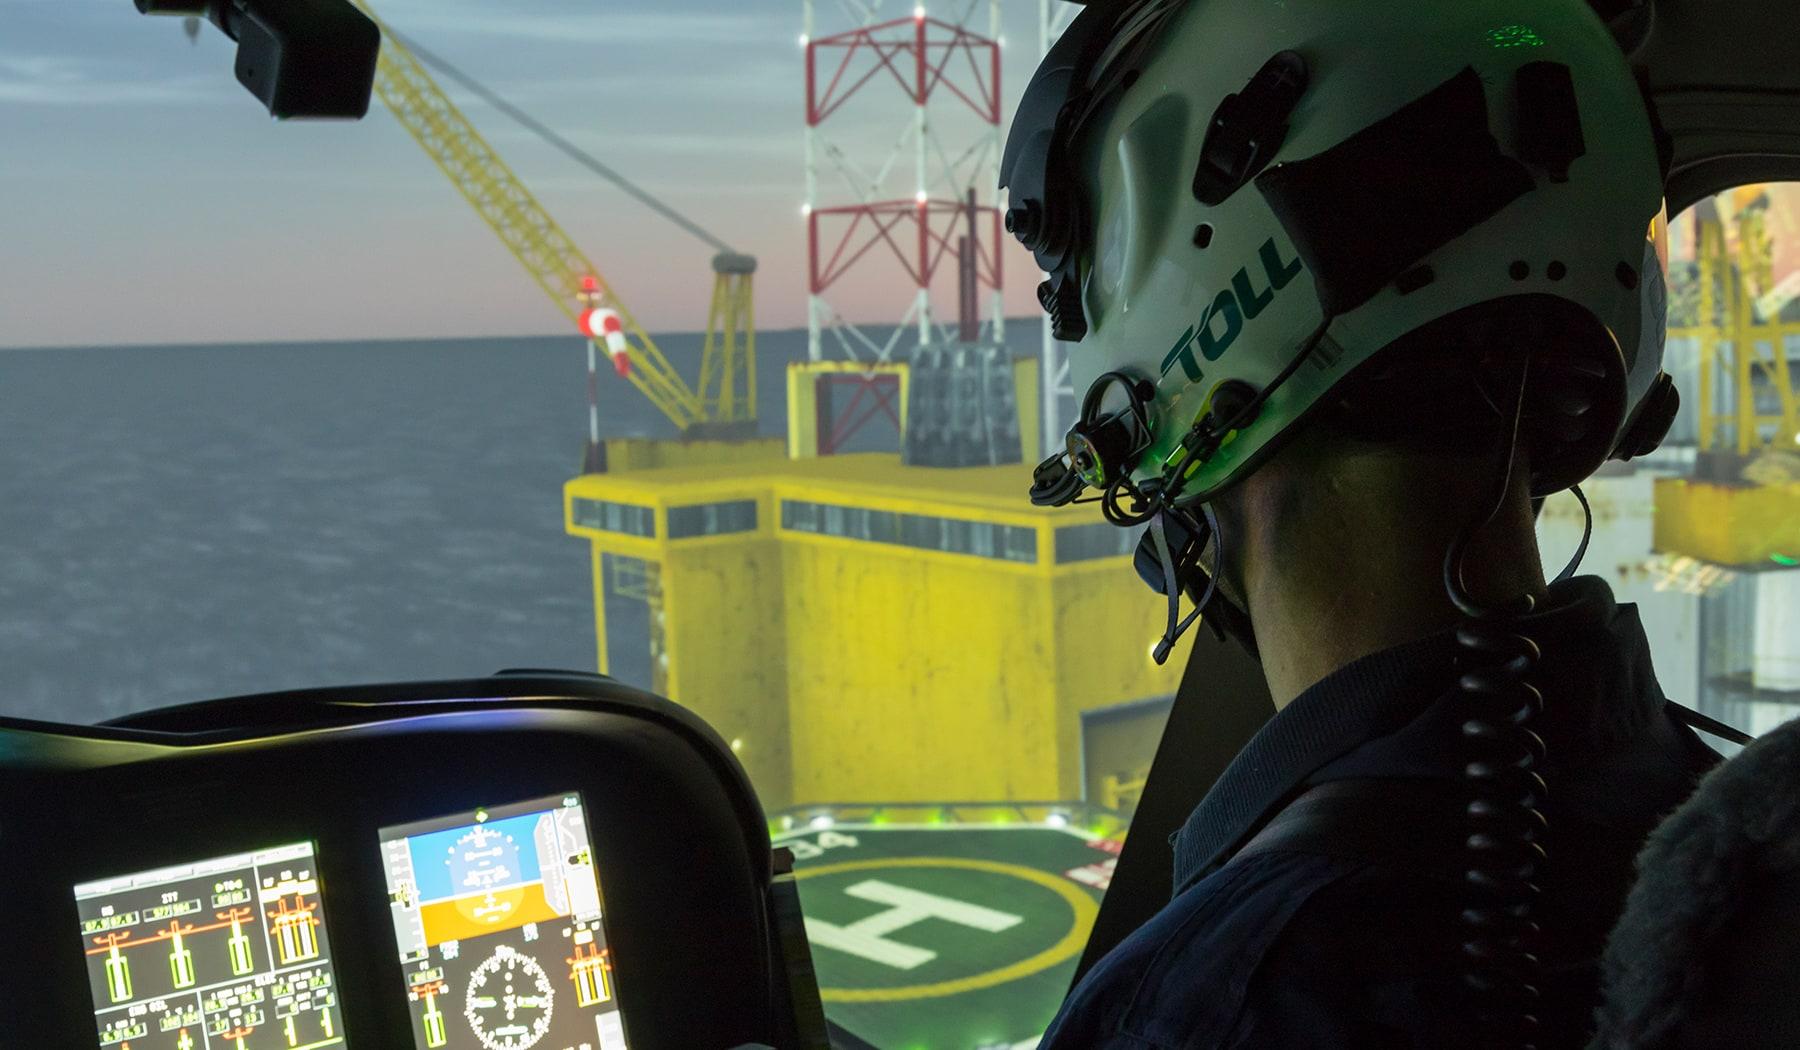 AW139 simulator